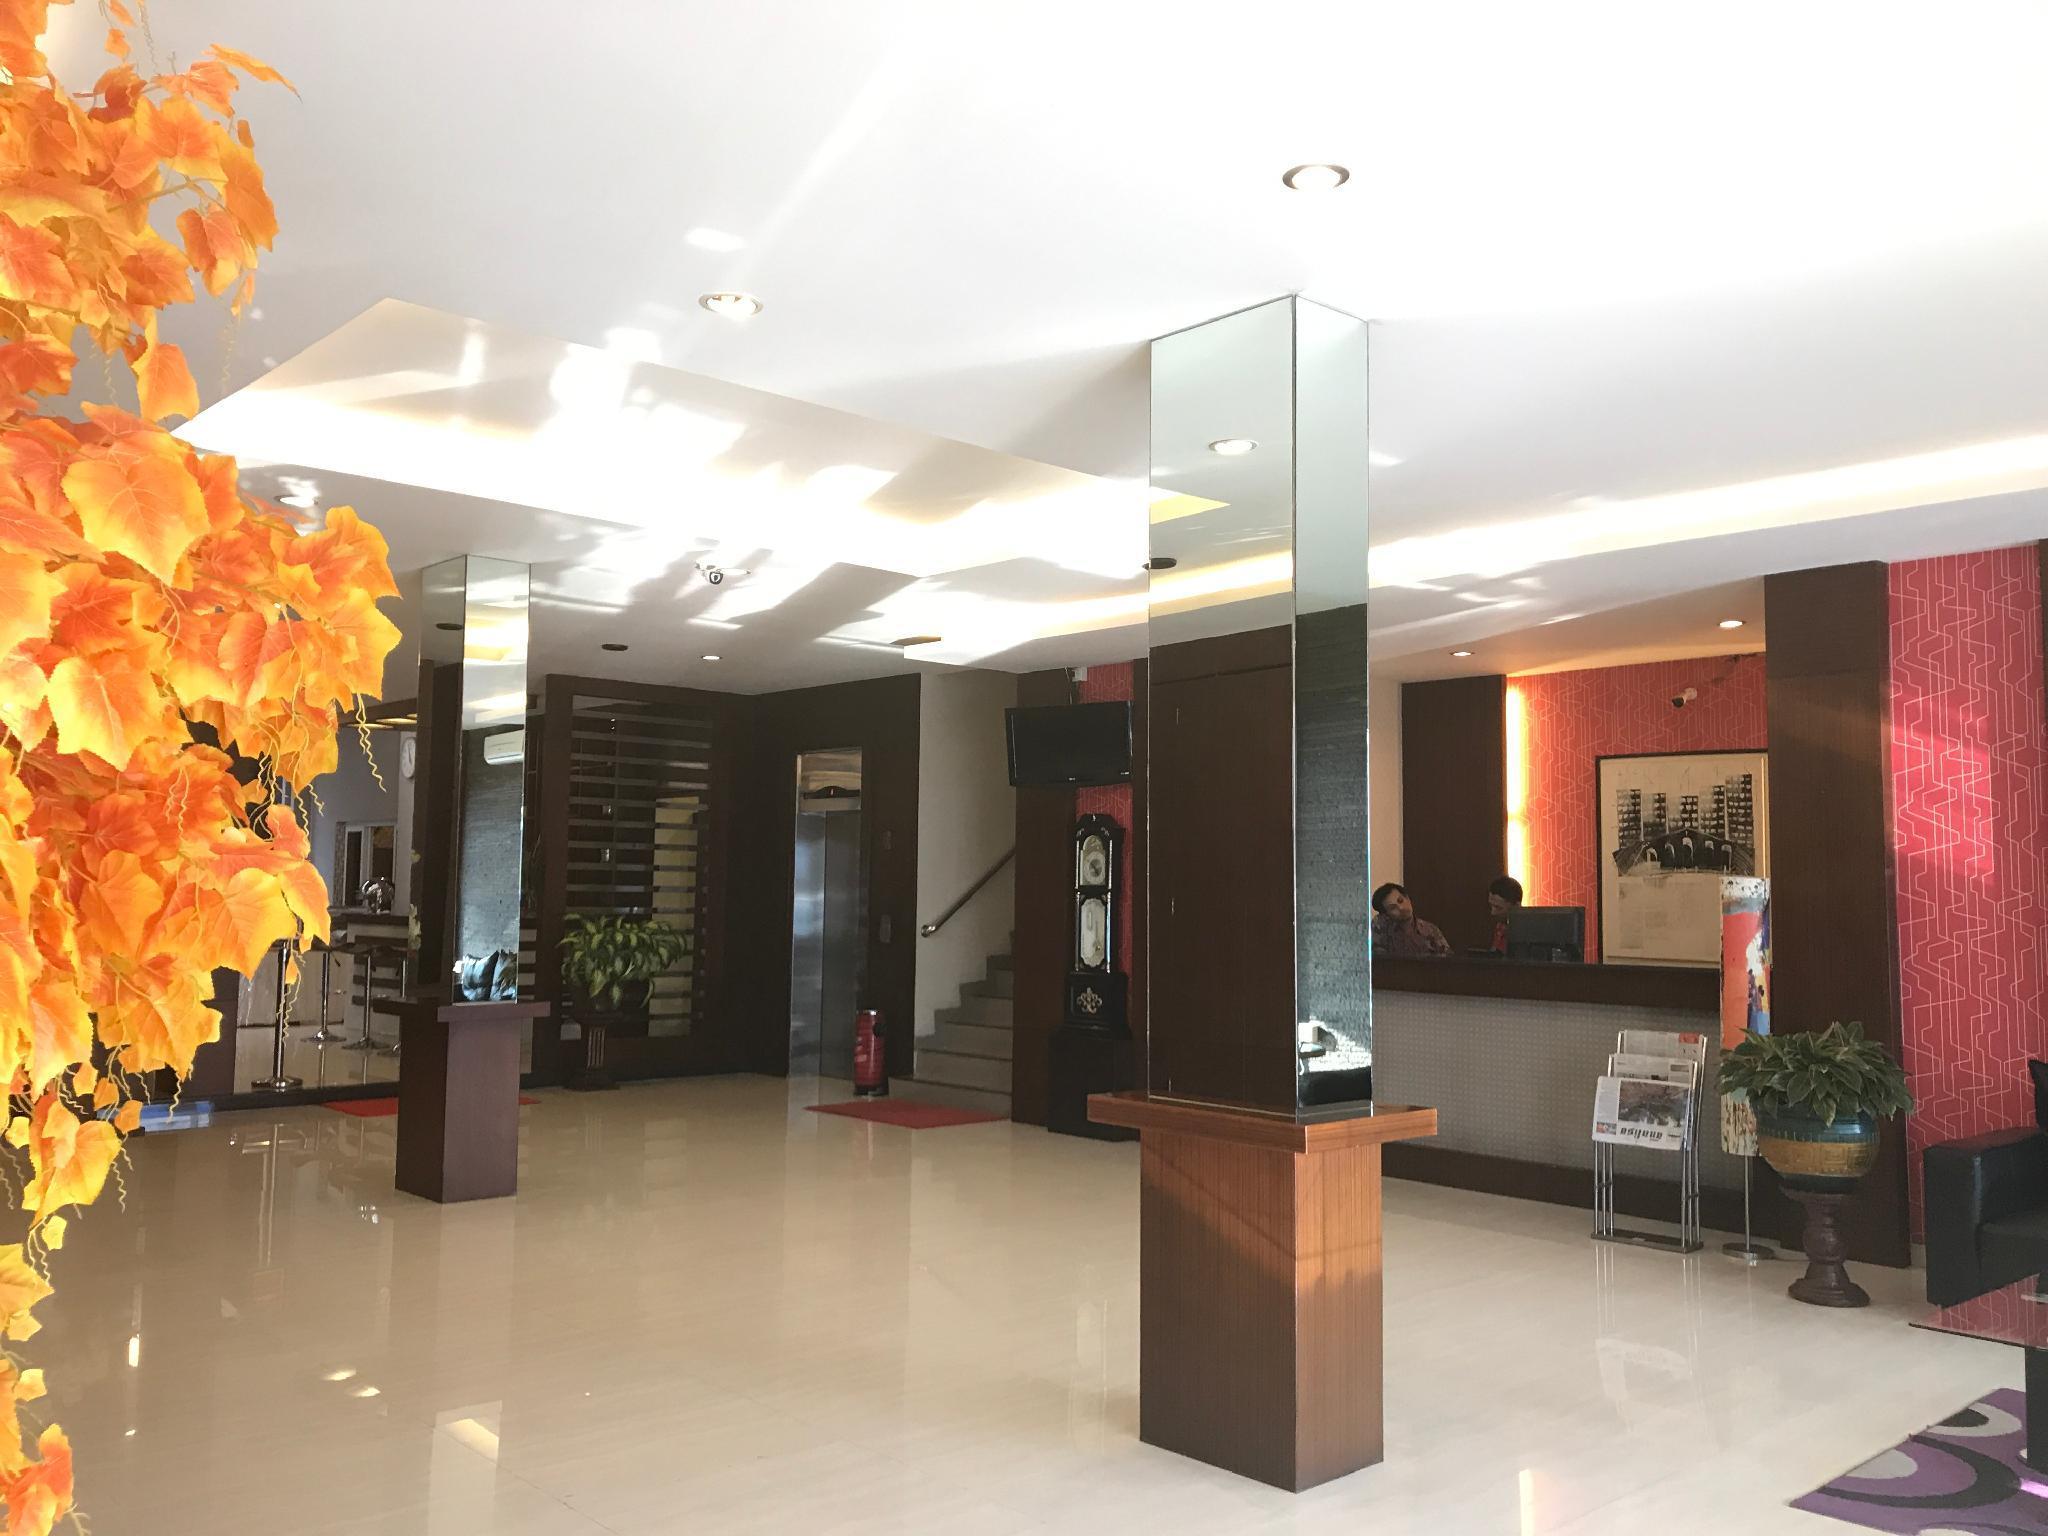 10 best pematangsiantar hotels hd photos reviews of hotels in rh agoda com